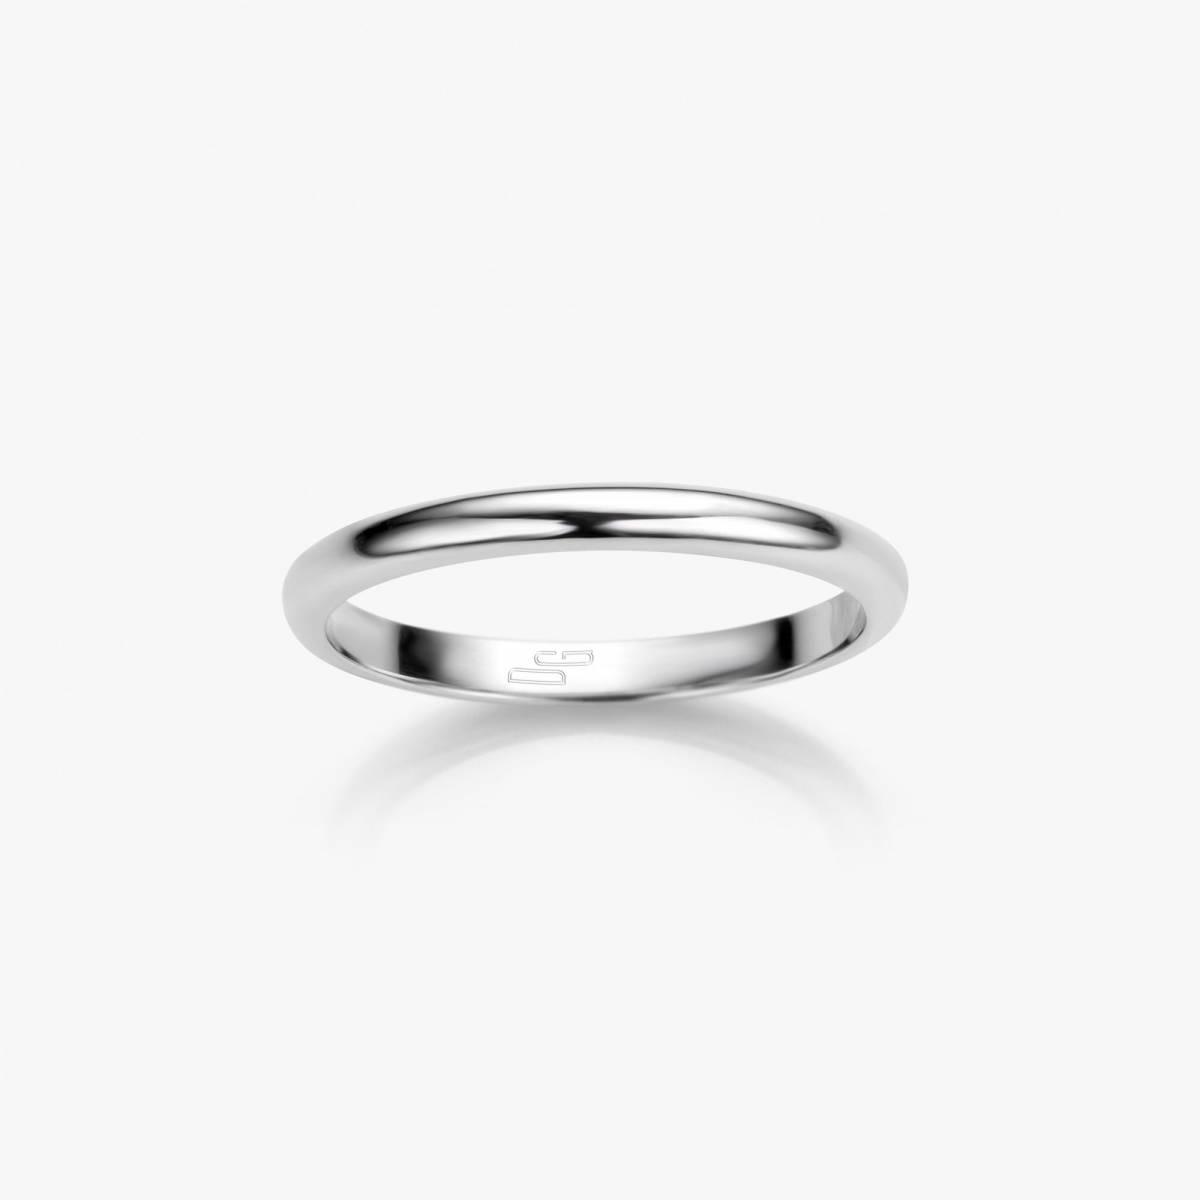 Maison De Greef - Juwelen - Brussel - Bruidsjuwelen - Trouwring - Verlovingsring - House of Weddings - 10